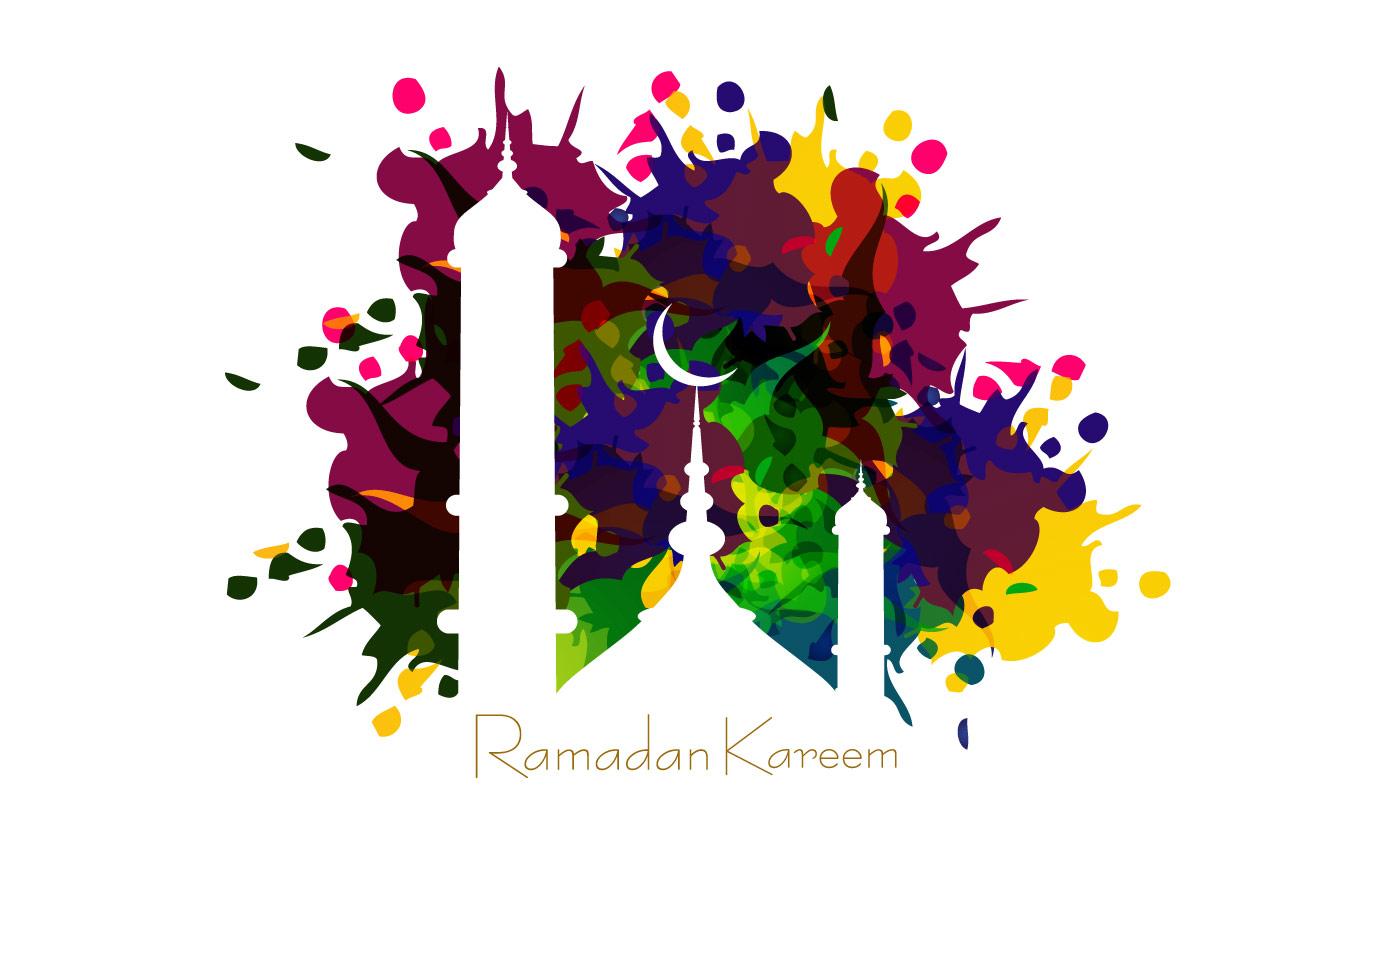 mosque on ramadan kareem card download free vector art